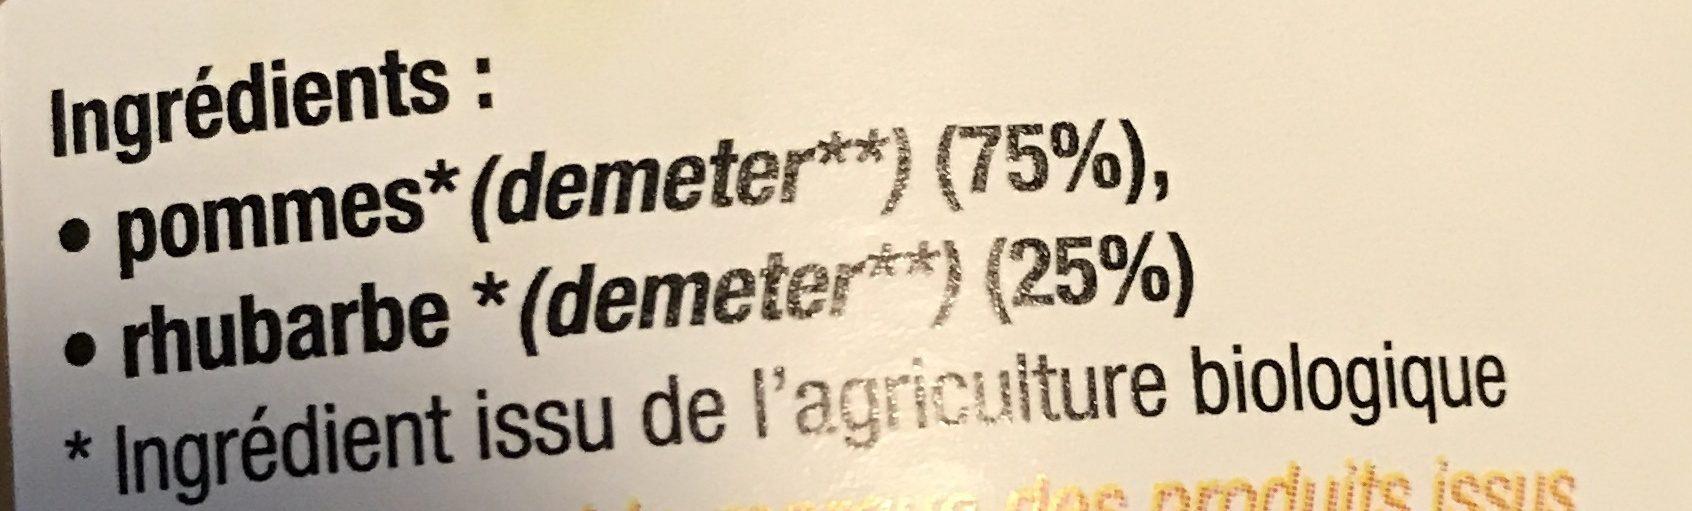 Purée Pommes Rhubarbe - Ingrédients - fr